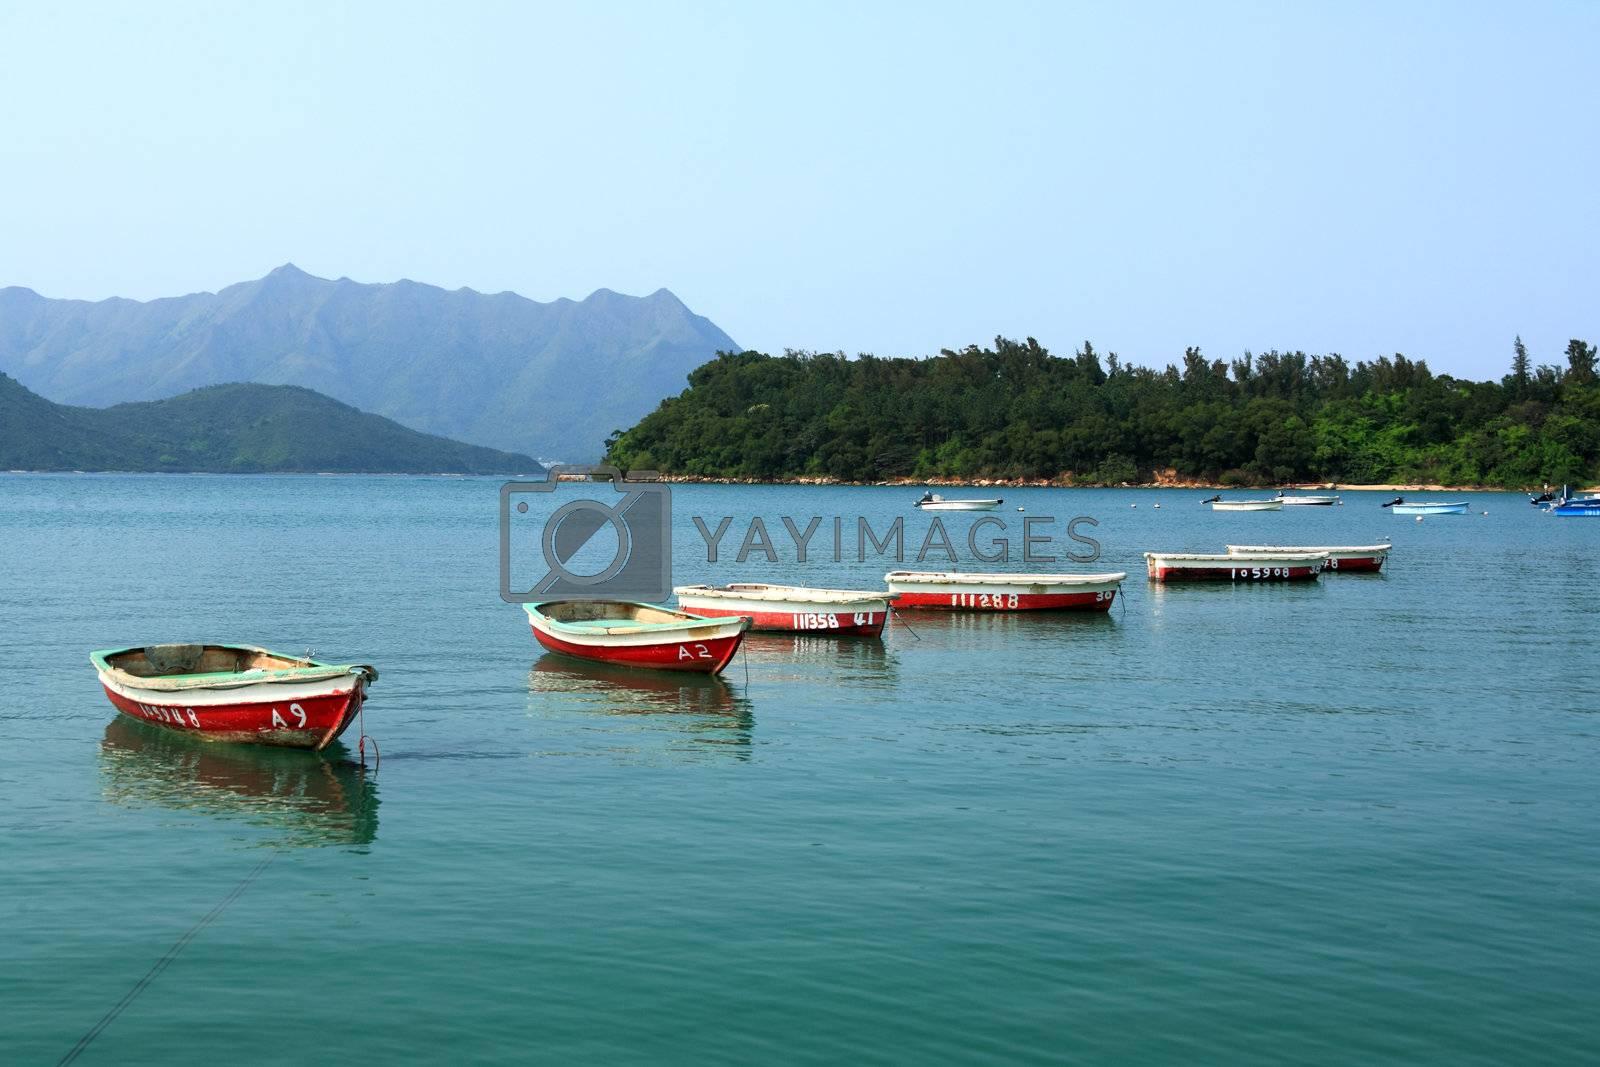 Royalty free image of boats on lake by leungchopan